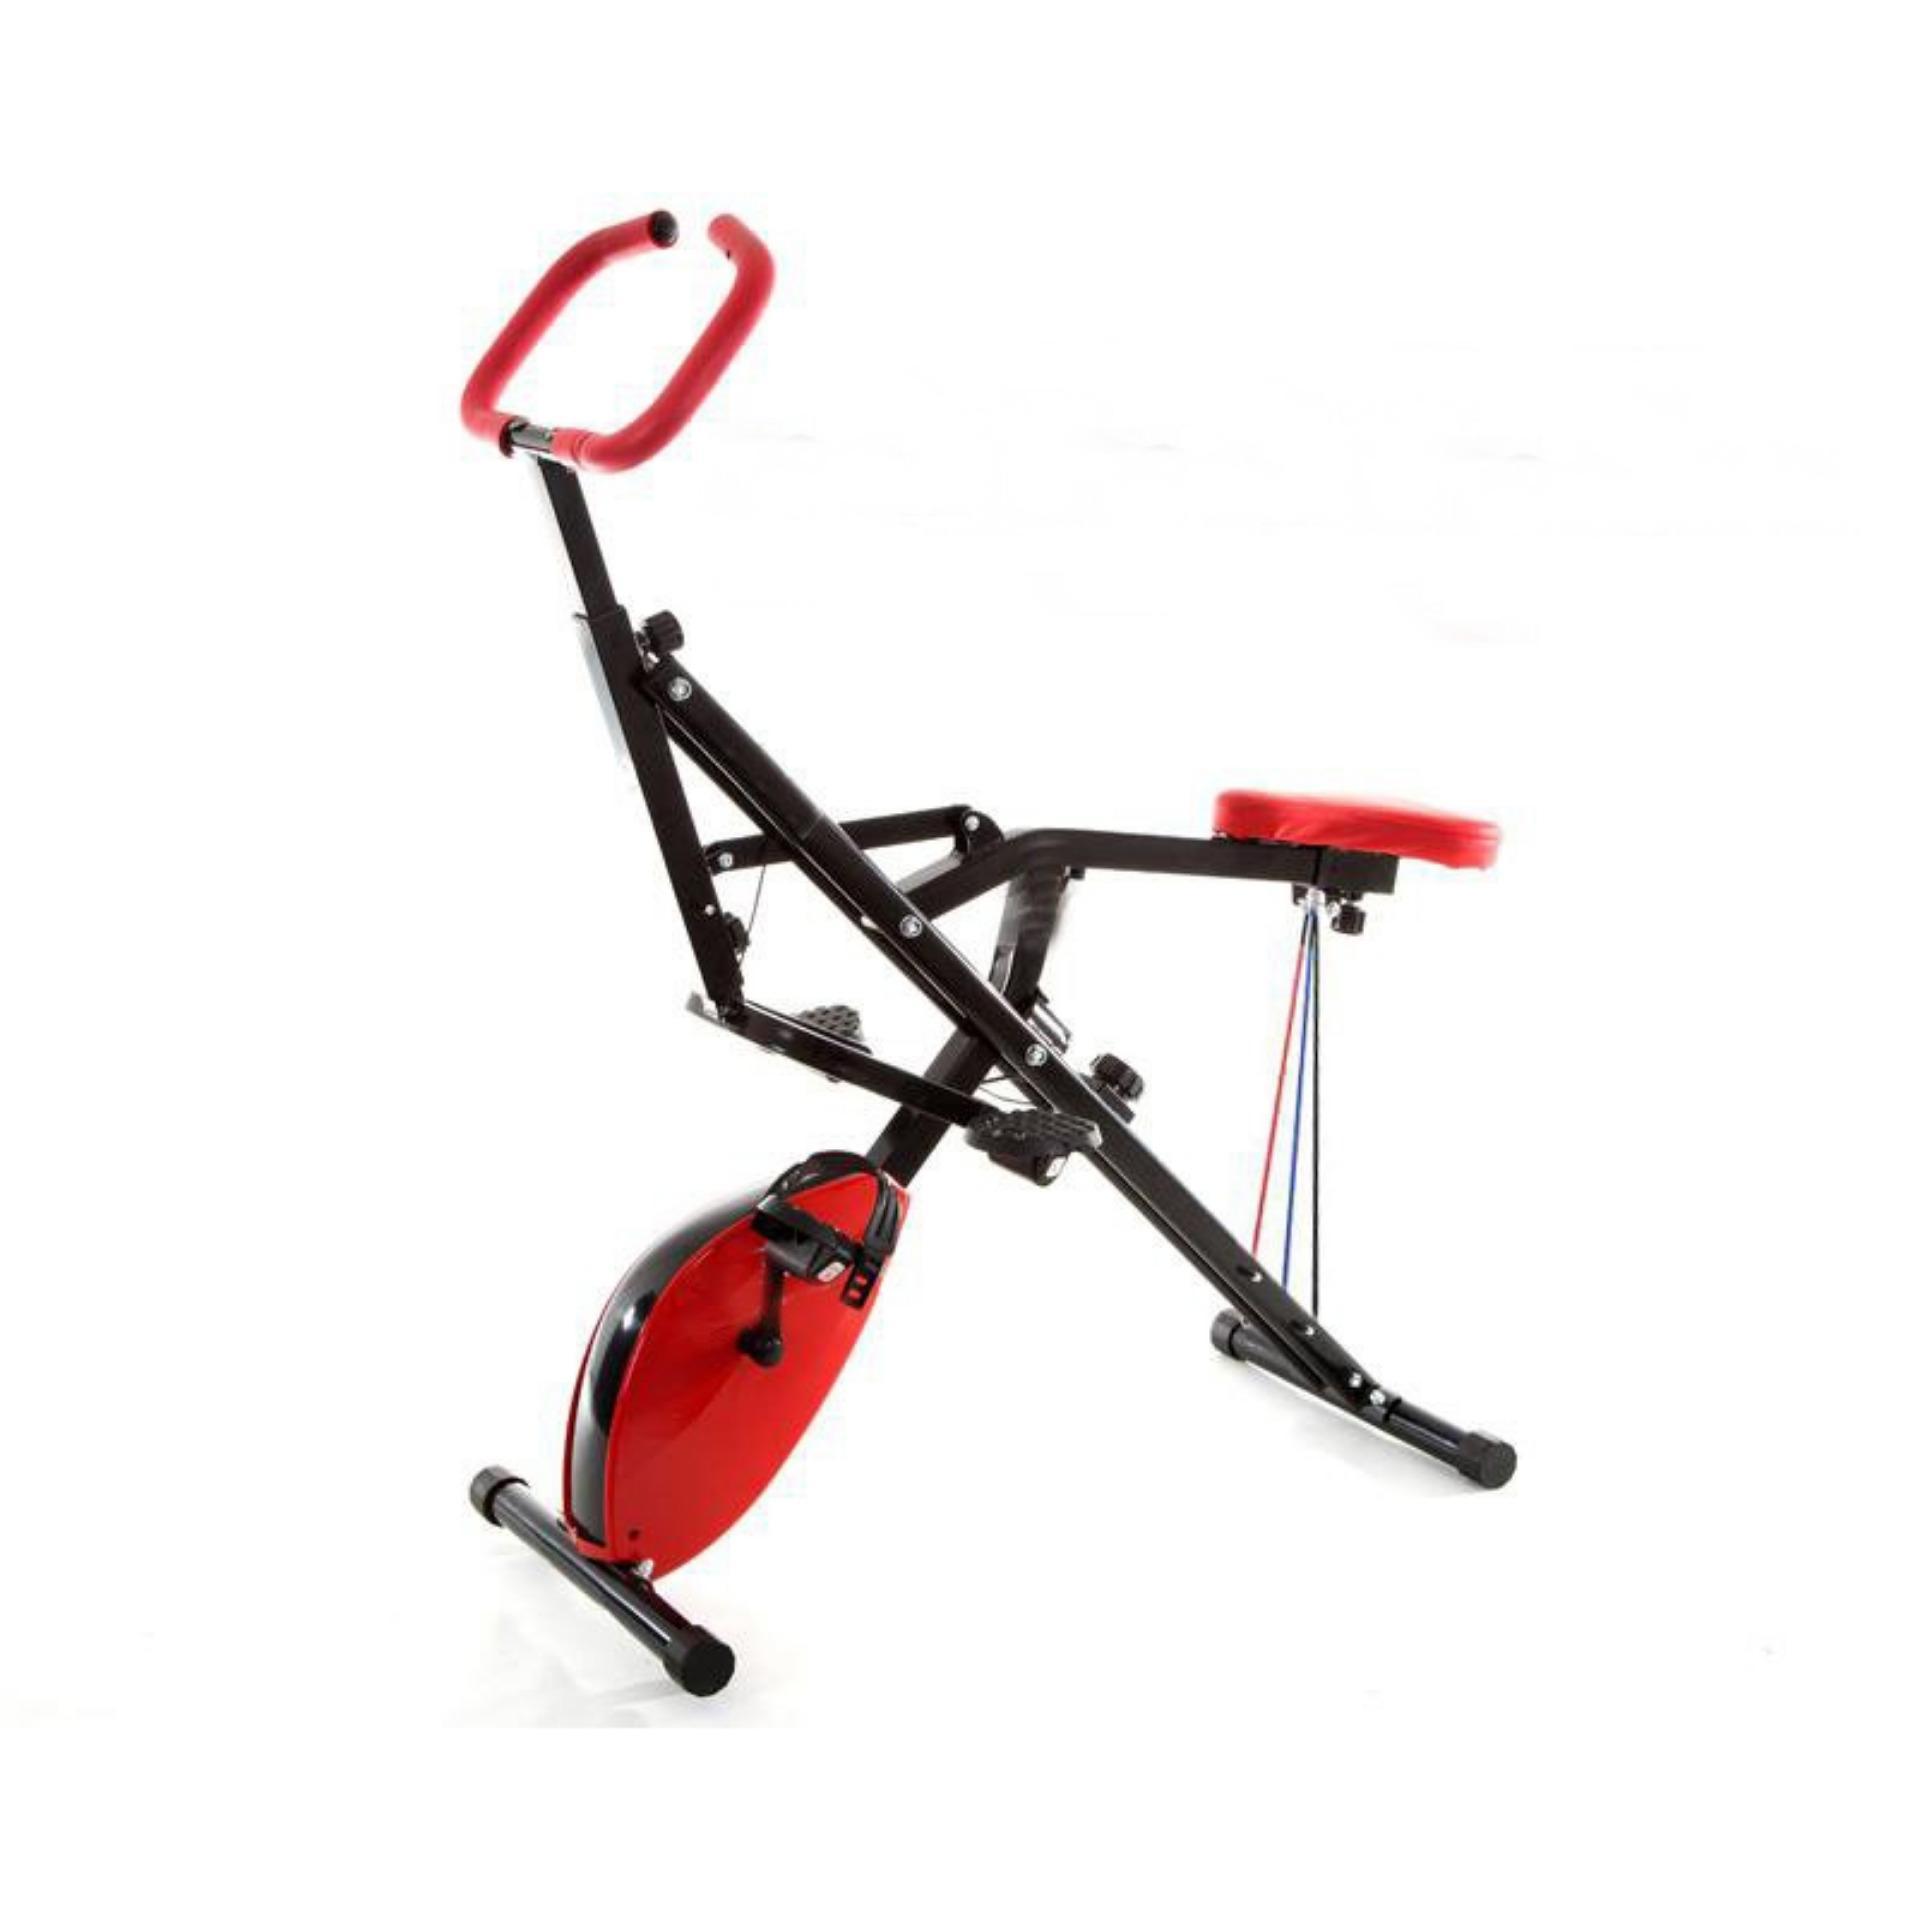 Total Fitness Sepeda Statis Orbitrek 5 In 1 Anti Gores Spec Dan Orbitrack Multifungsi Orb2000s Horse Bike Rider Tl8218